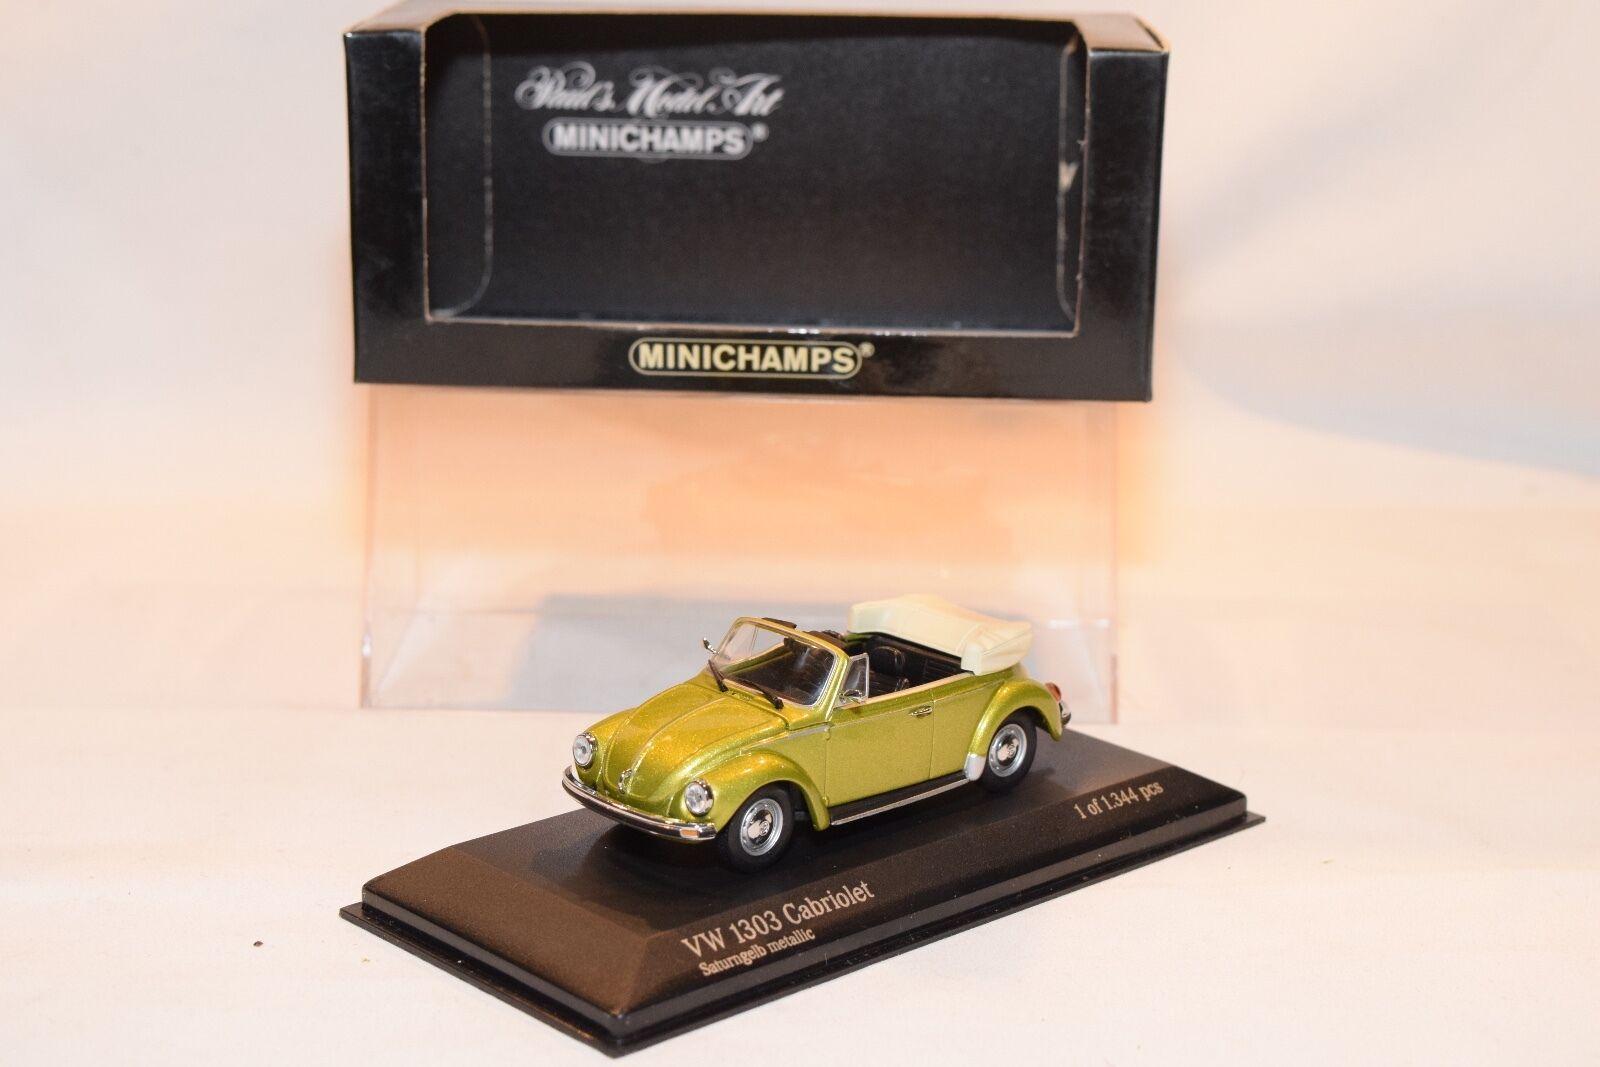 MINICHAMPS VW VOLKSWAGEN 1303 CABRIOLET BEETLE KAFER SATURNyellow YELLOW MINTBOXED